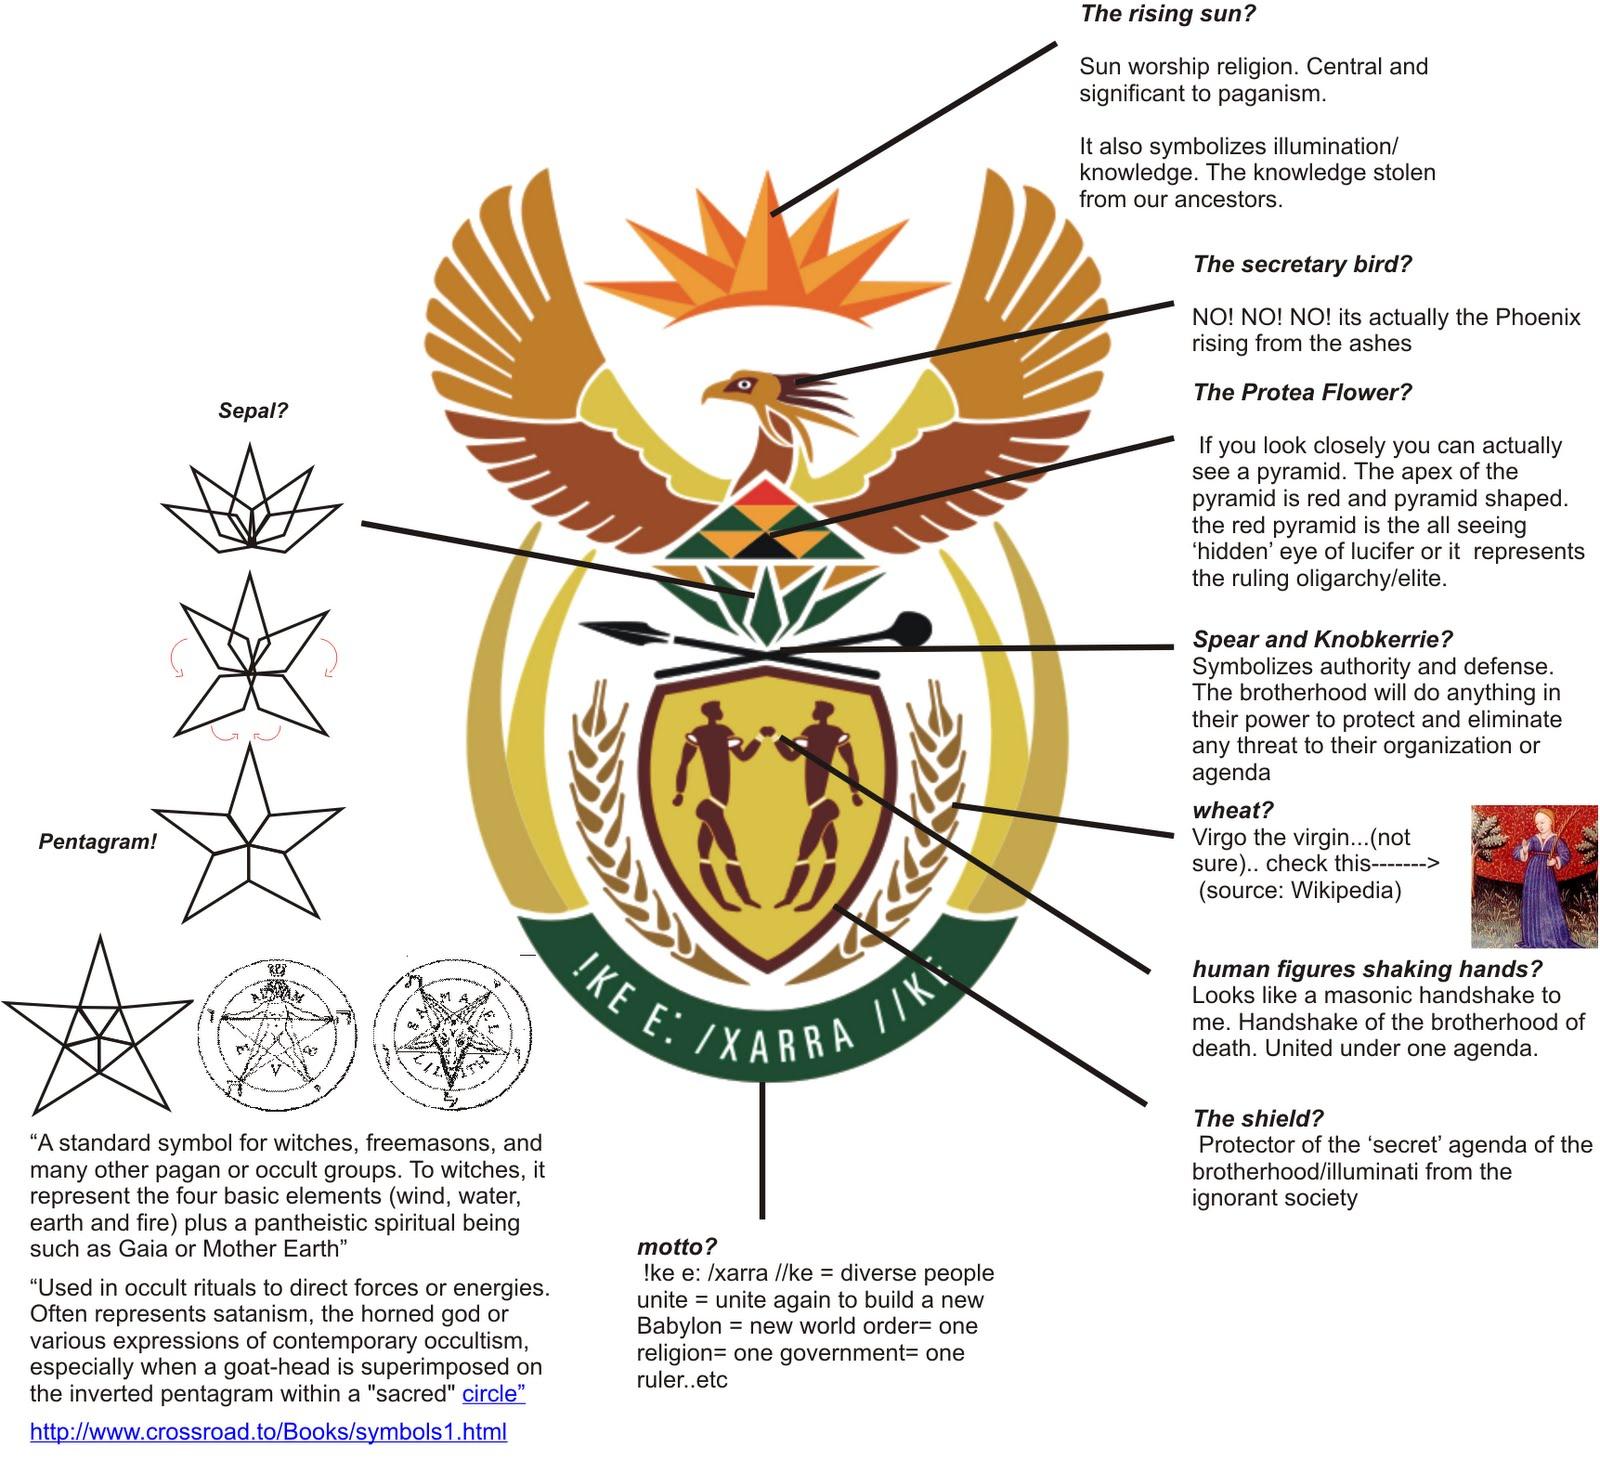 Illuminati In South Africa Illuminati And Masonic Symbols In The